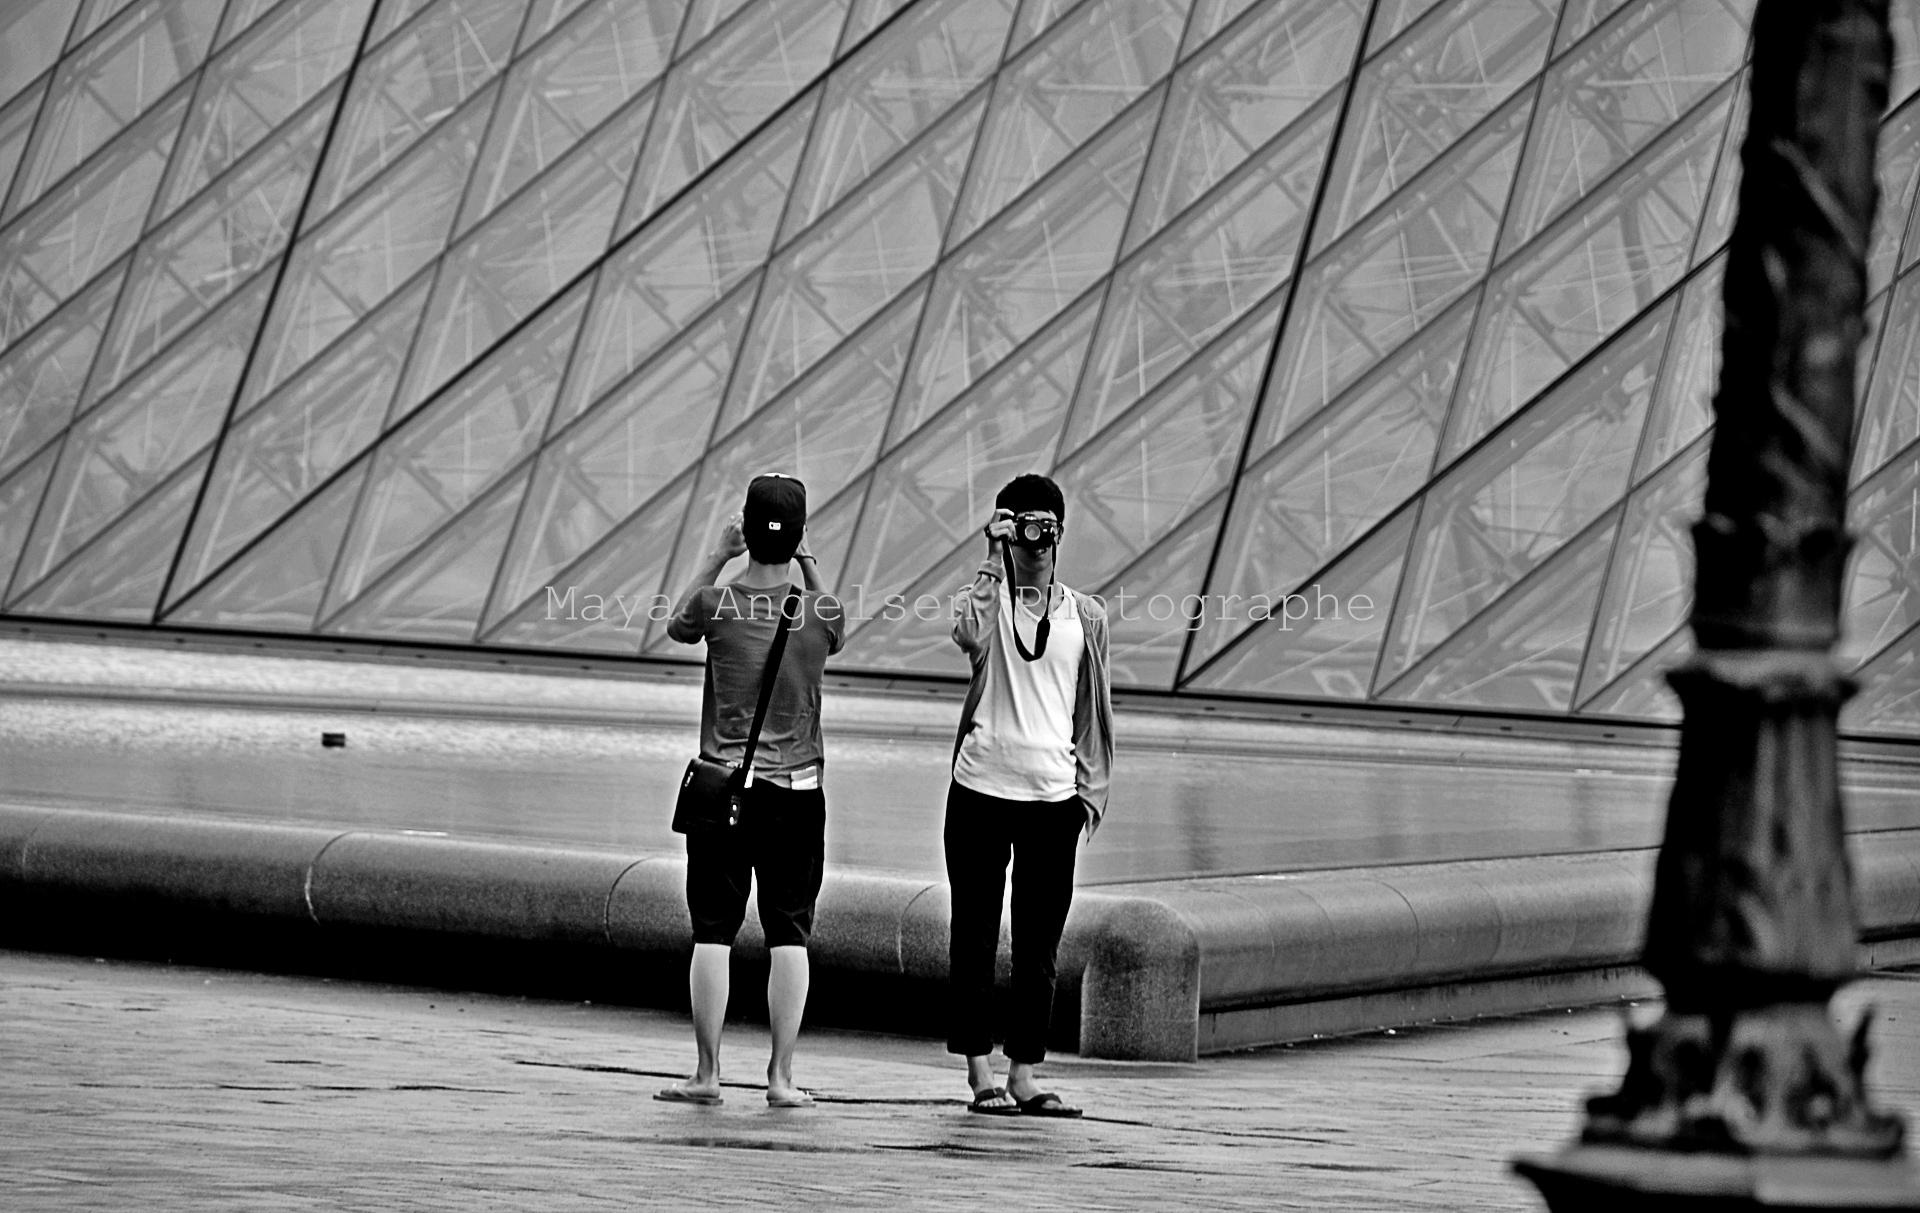 Photographe-streetphoto-Maya-Angelsen-Vice-versa